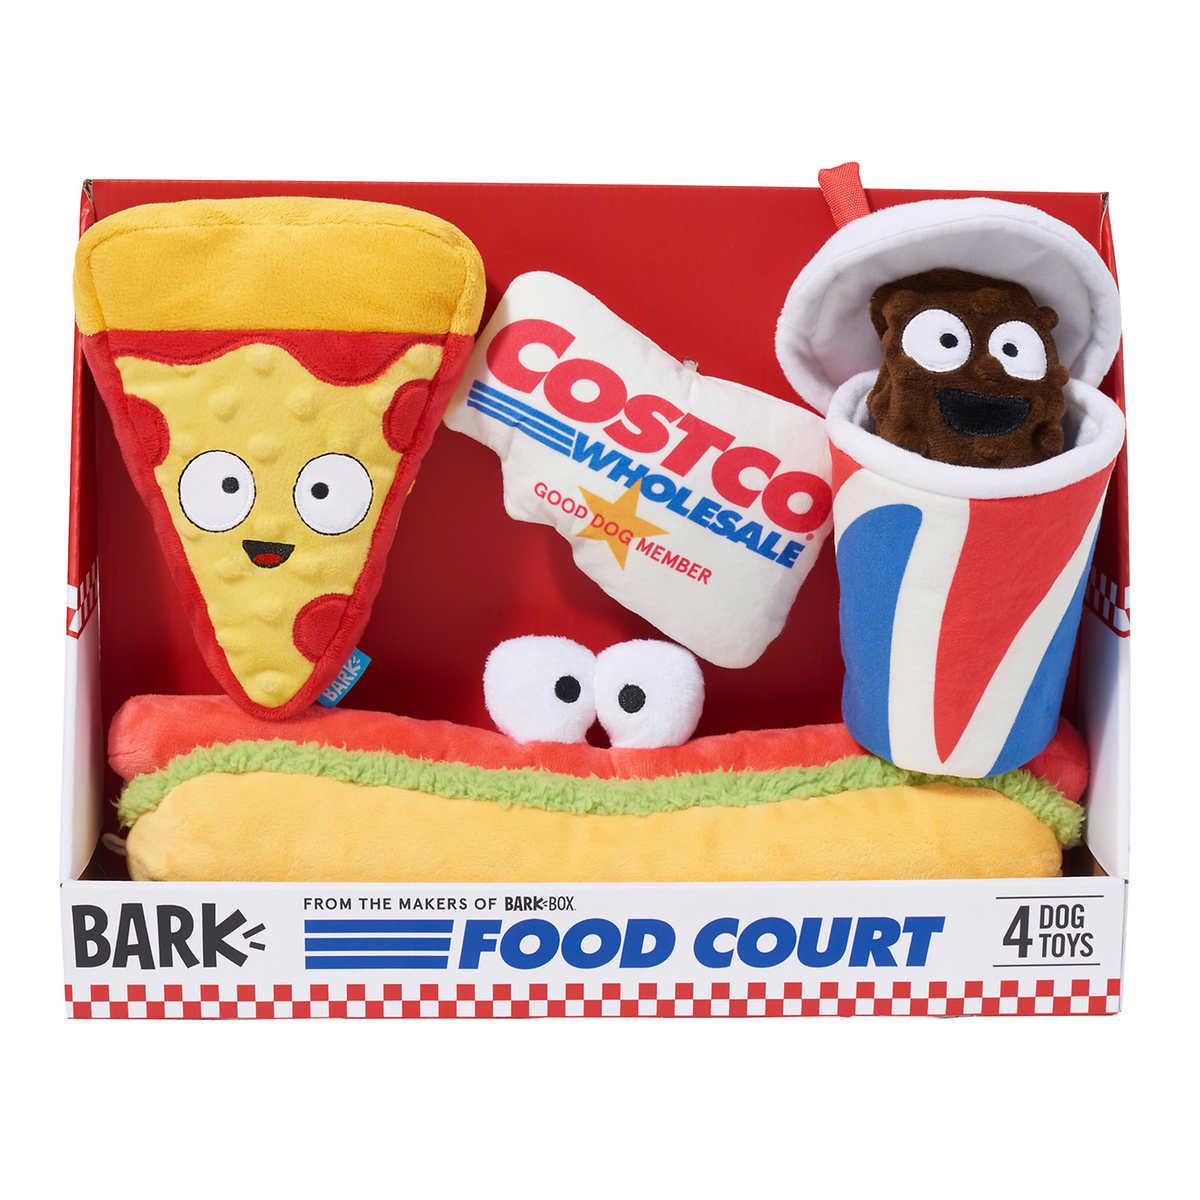 Bark Costco Food Court Dog Toy Bundle 4 Count